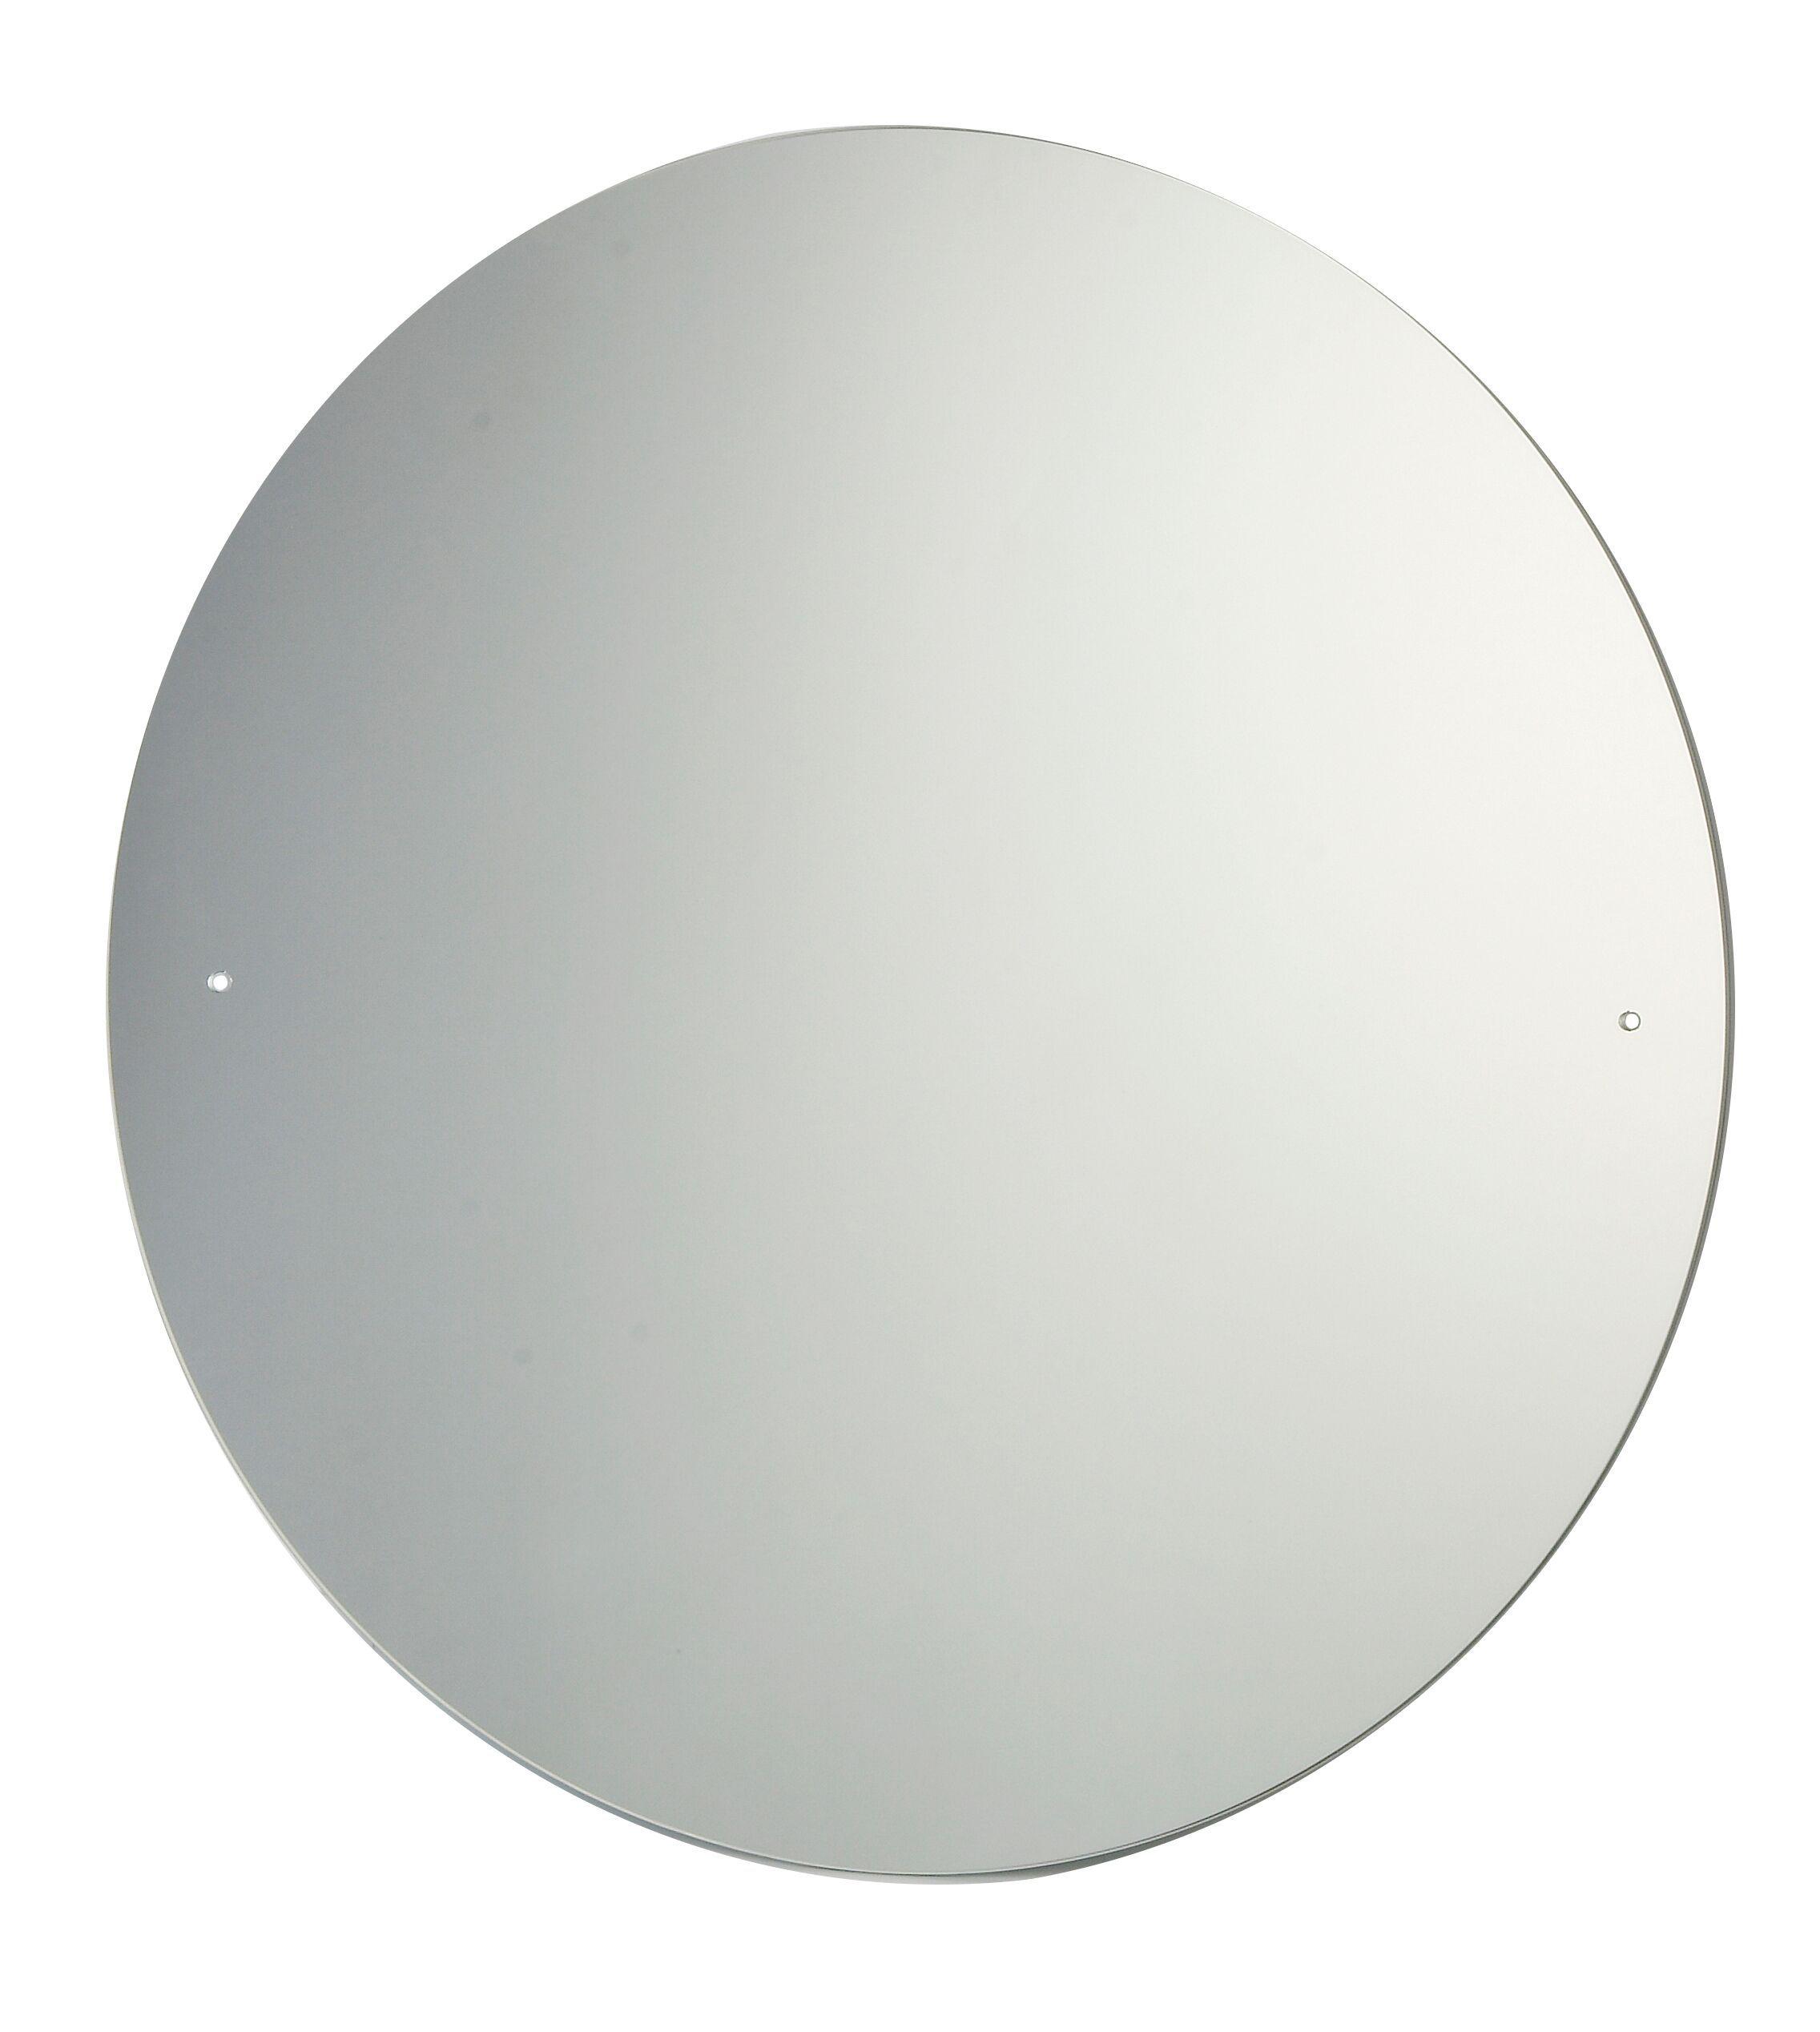 Unframed Circular Mirror H 600mm W 600mm Departments